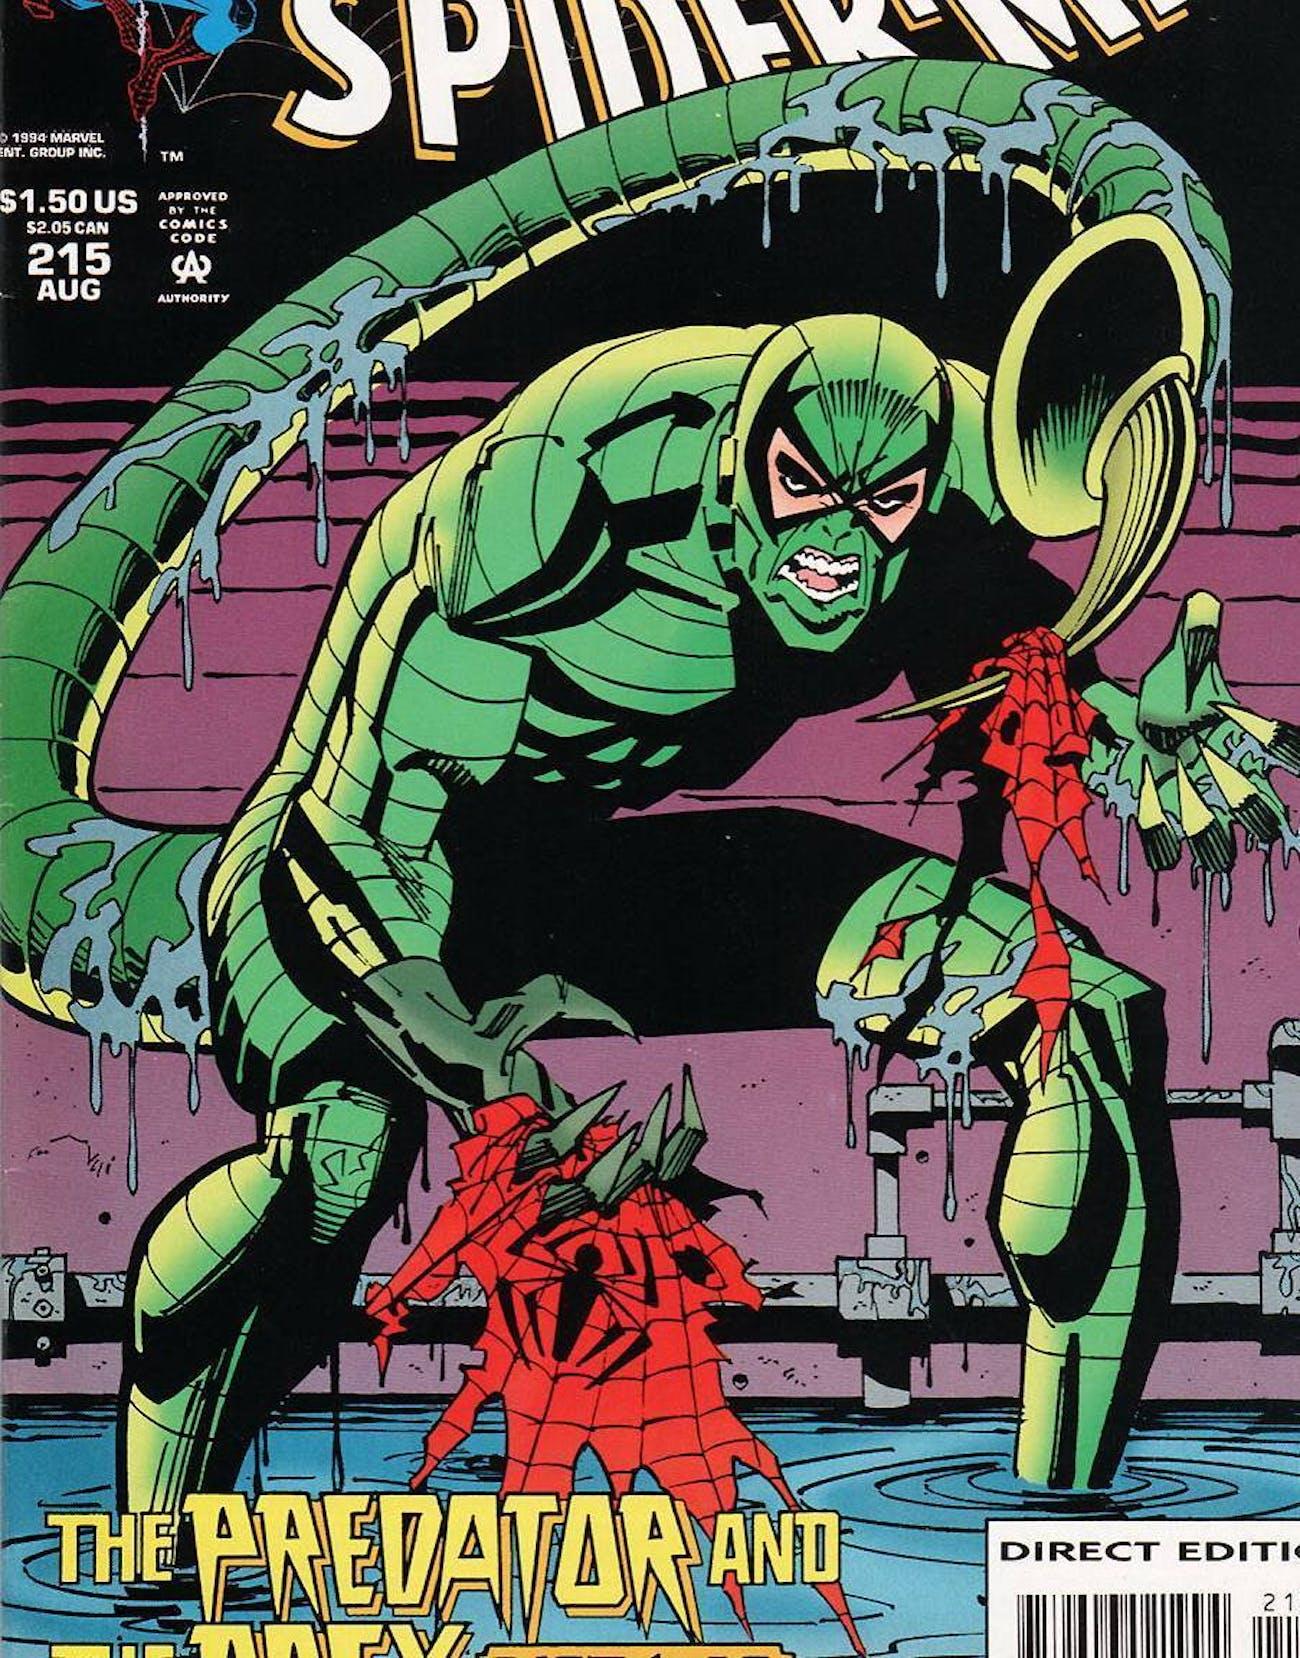 Spider-Man Homecoming Scorpion